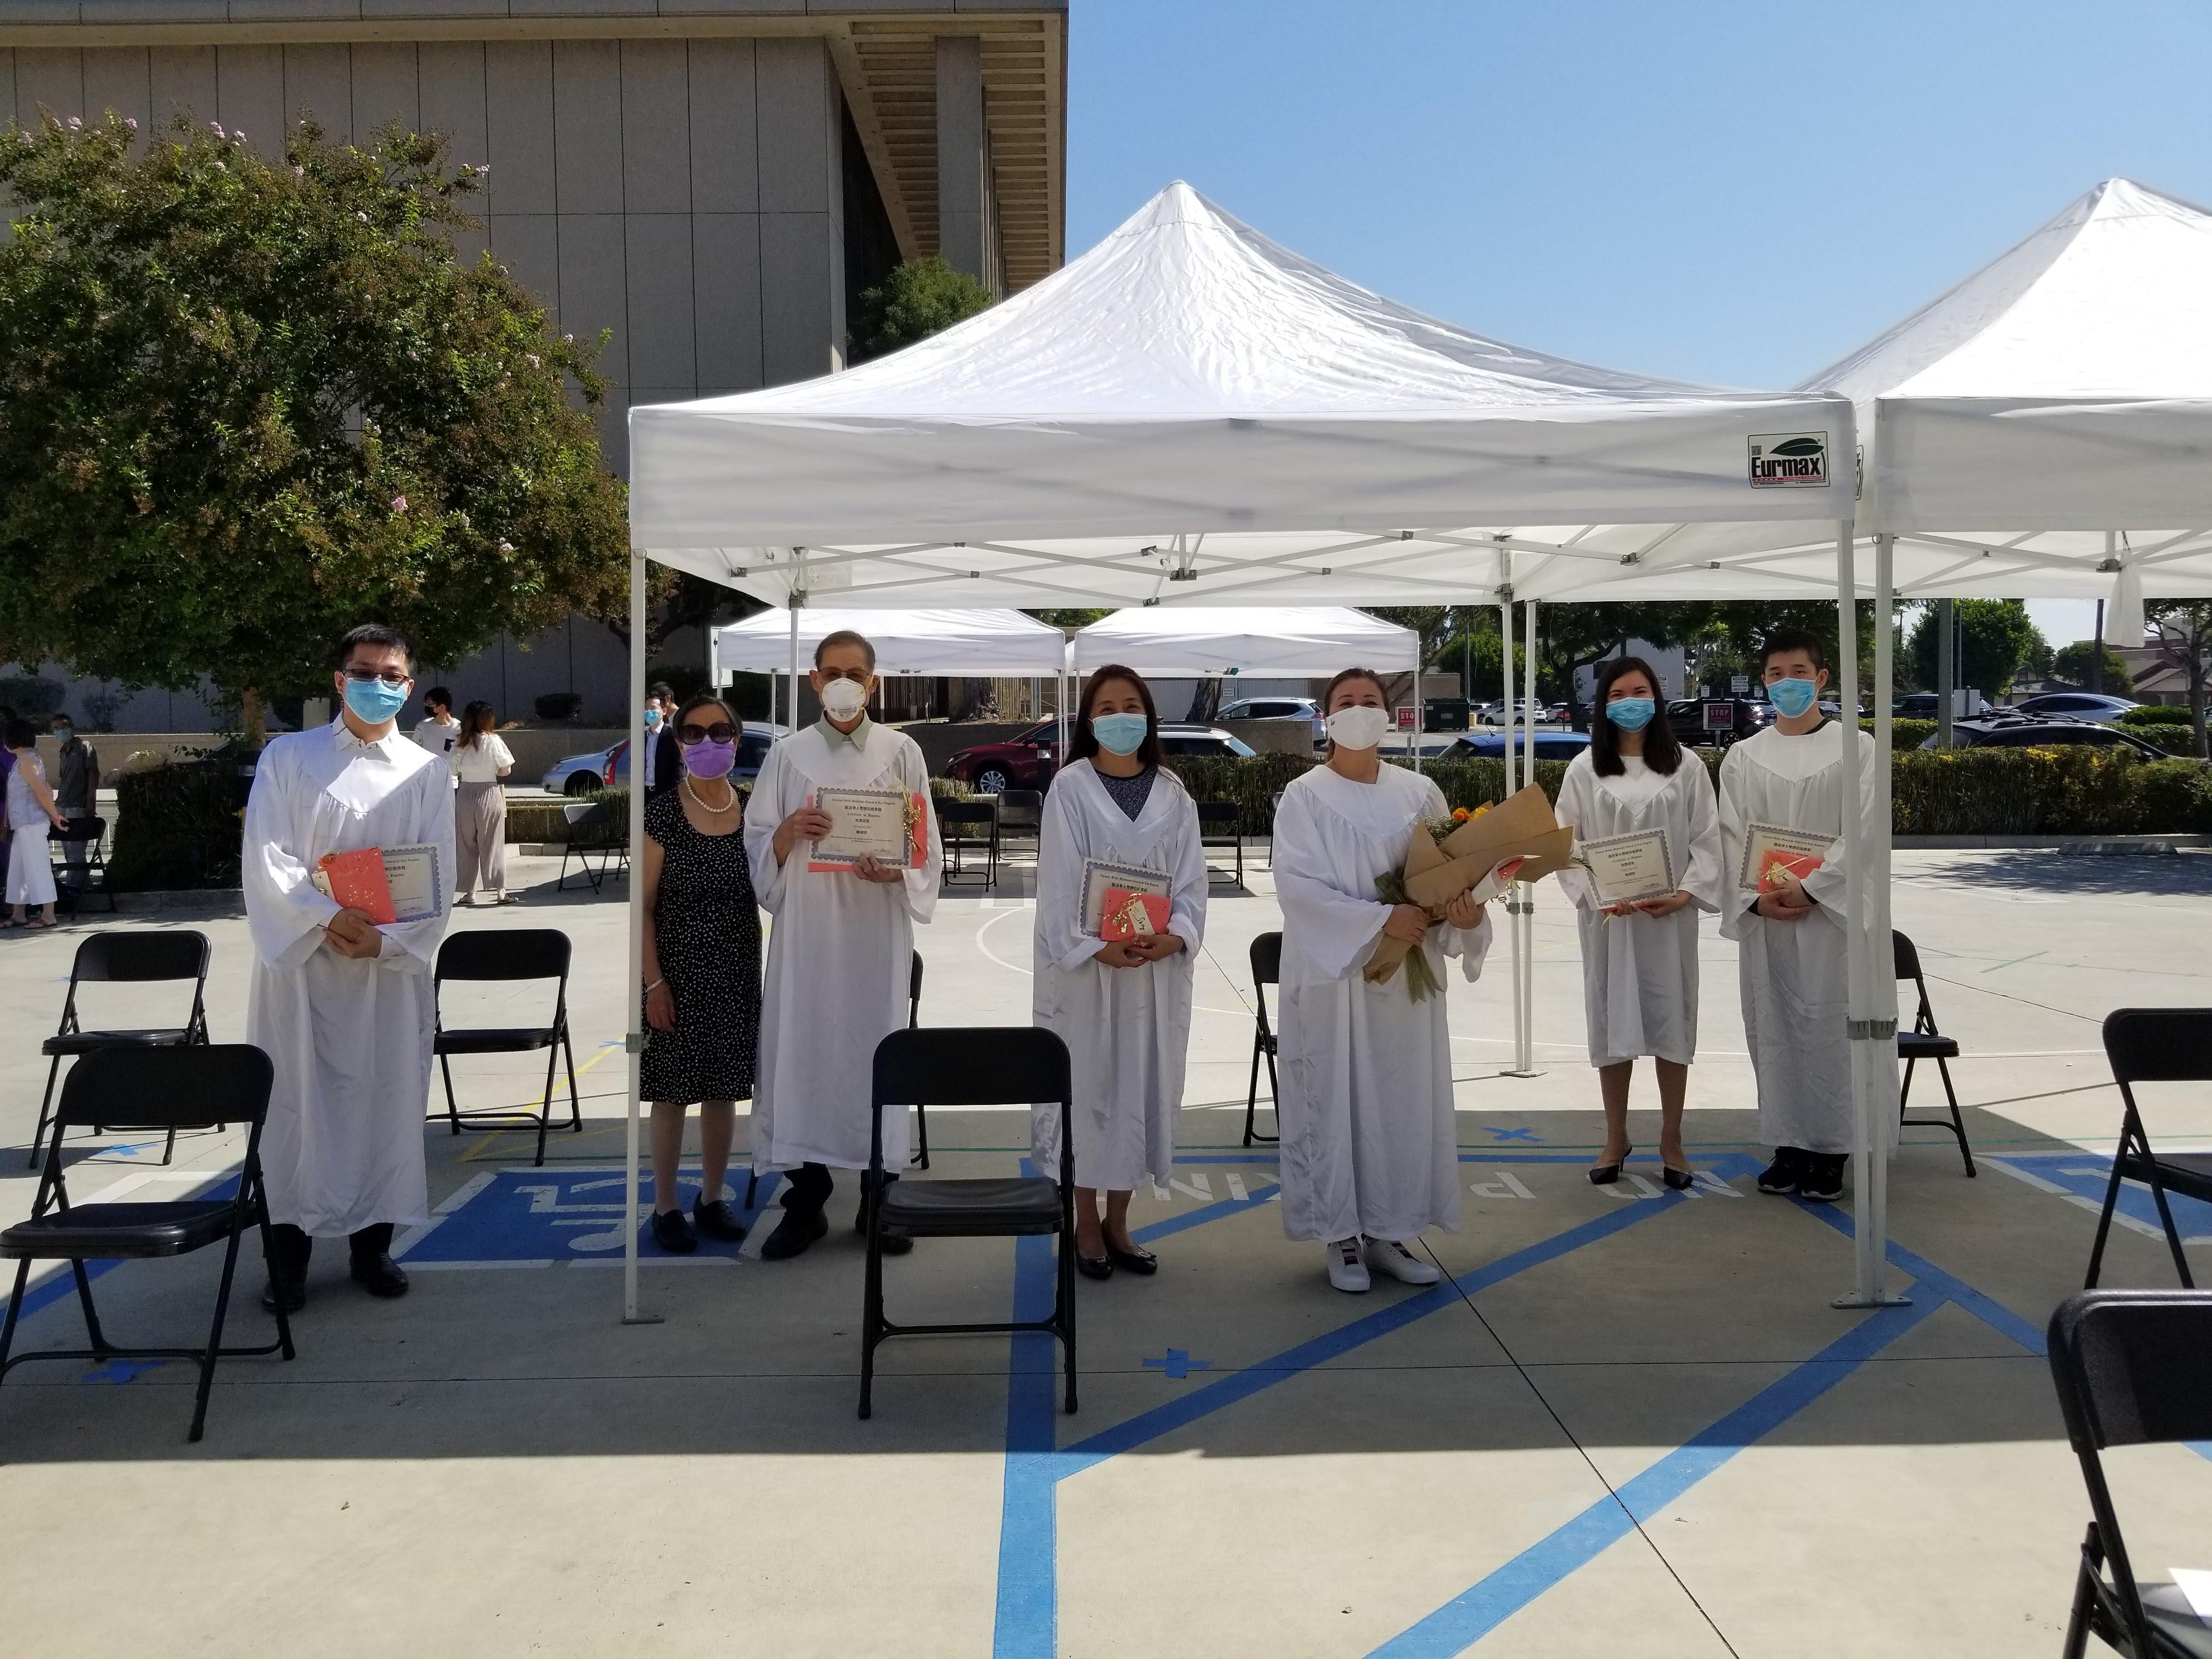 2020 Outdoor Baptism Ceremony